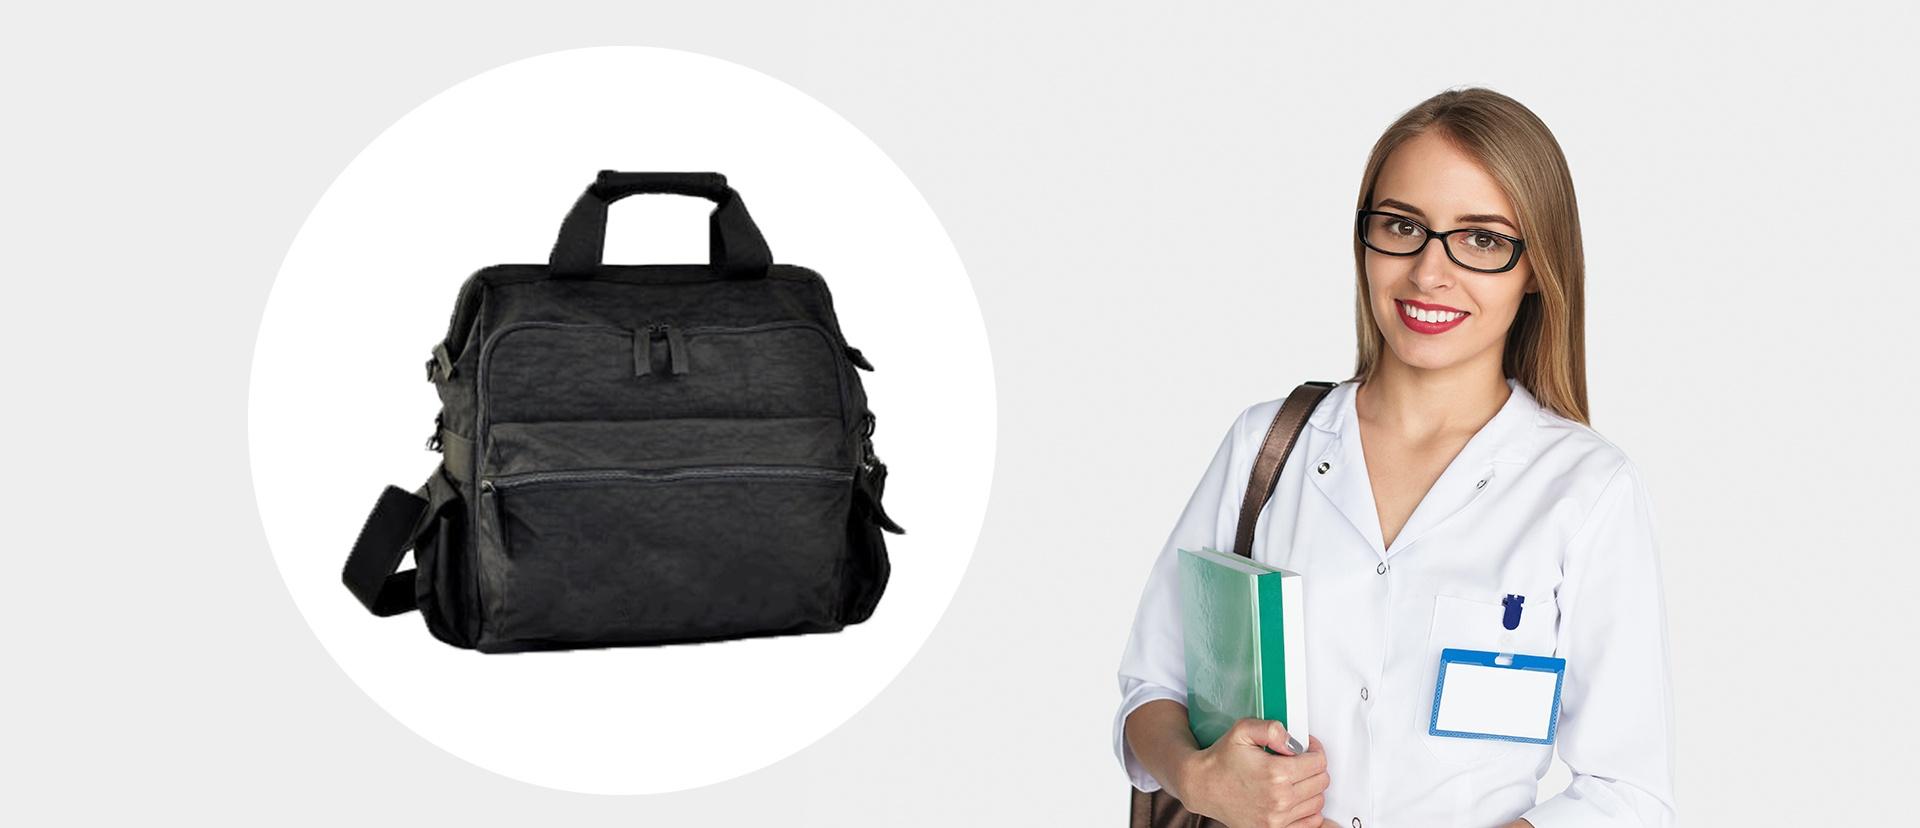 3 Essential Tips for Your Nursing Bag Technique